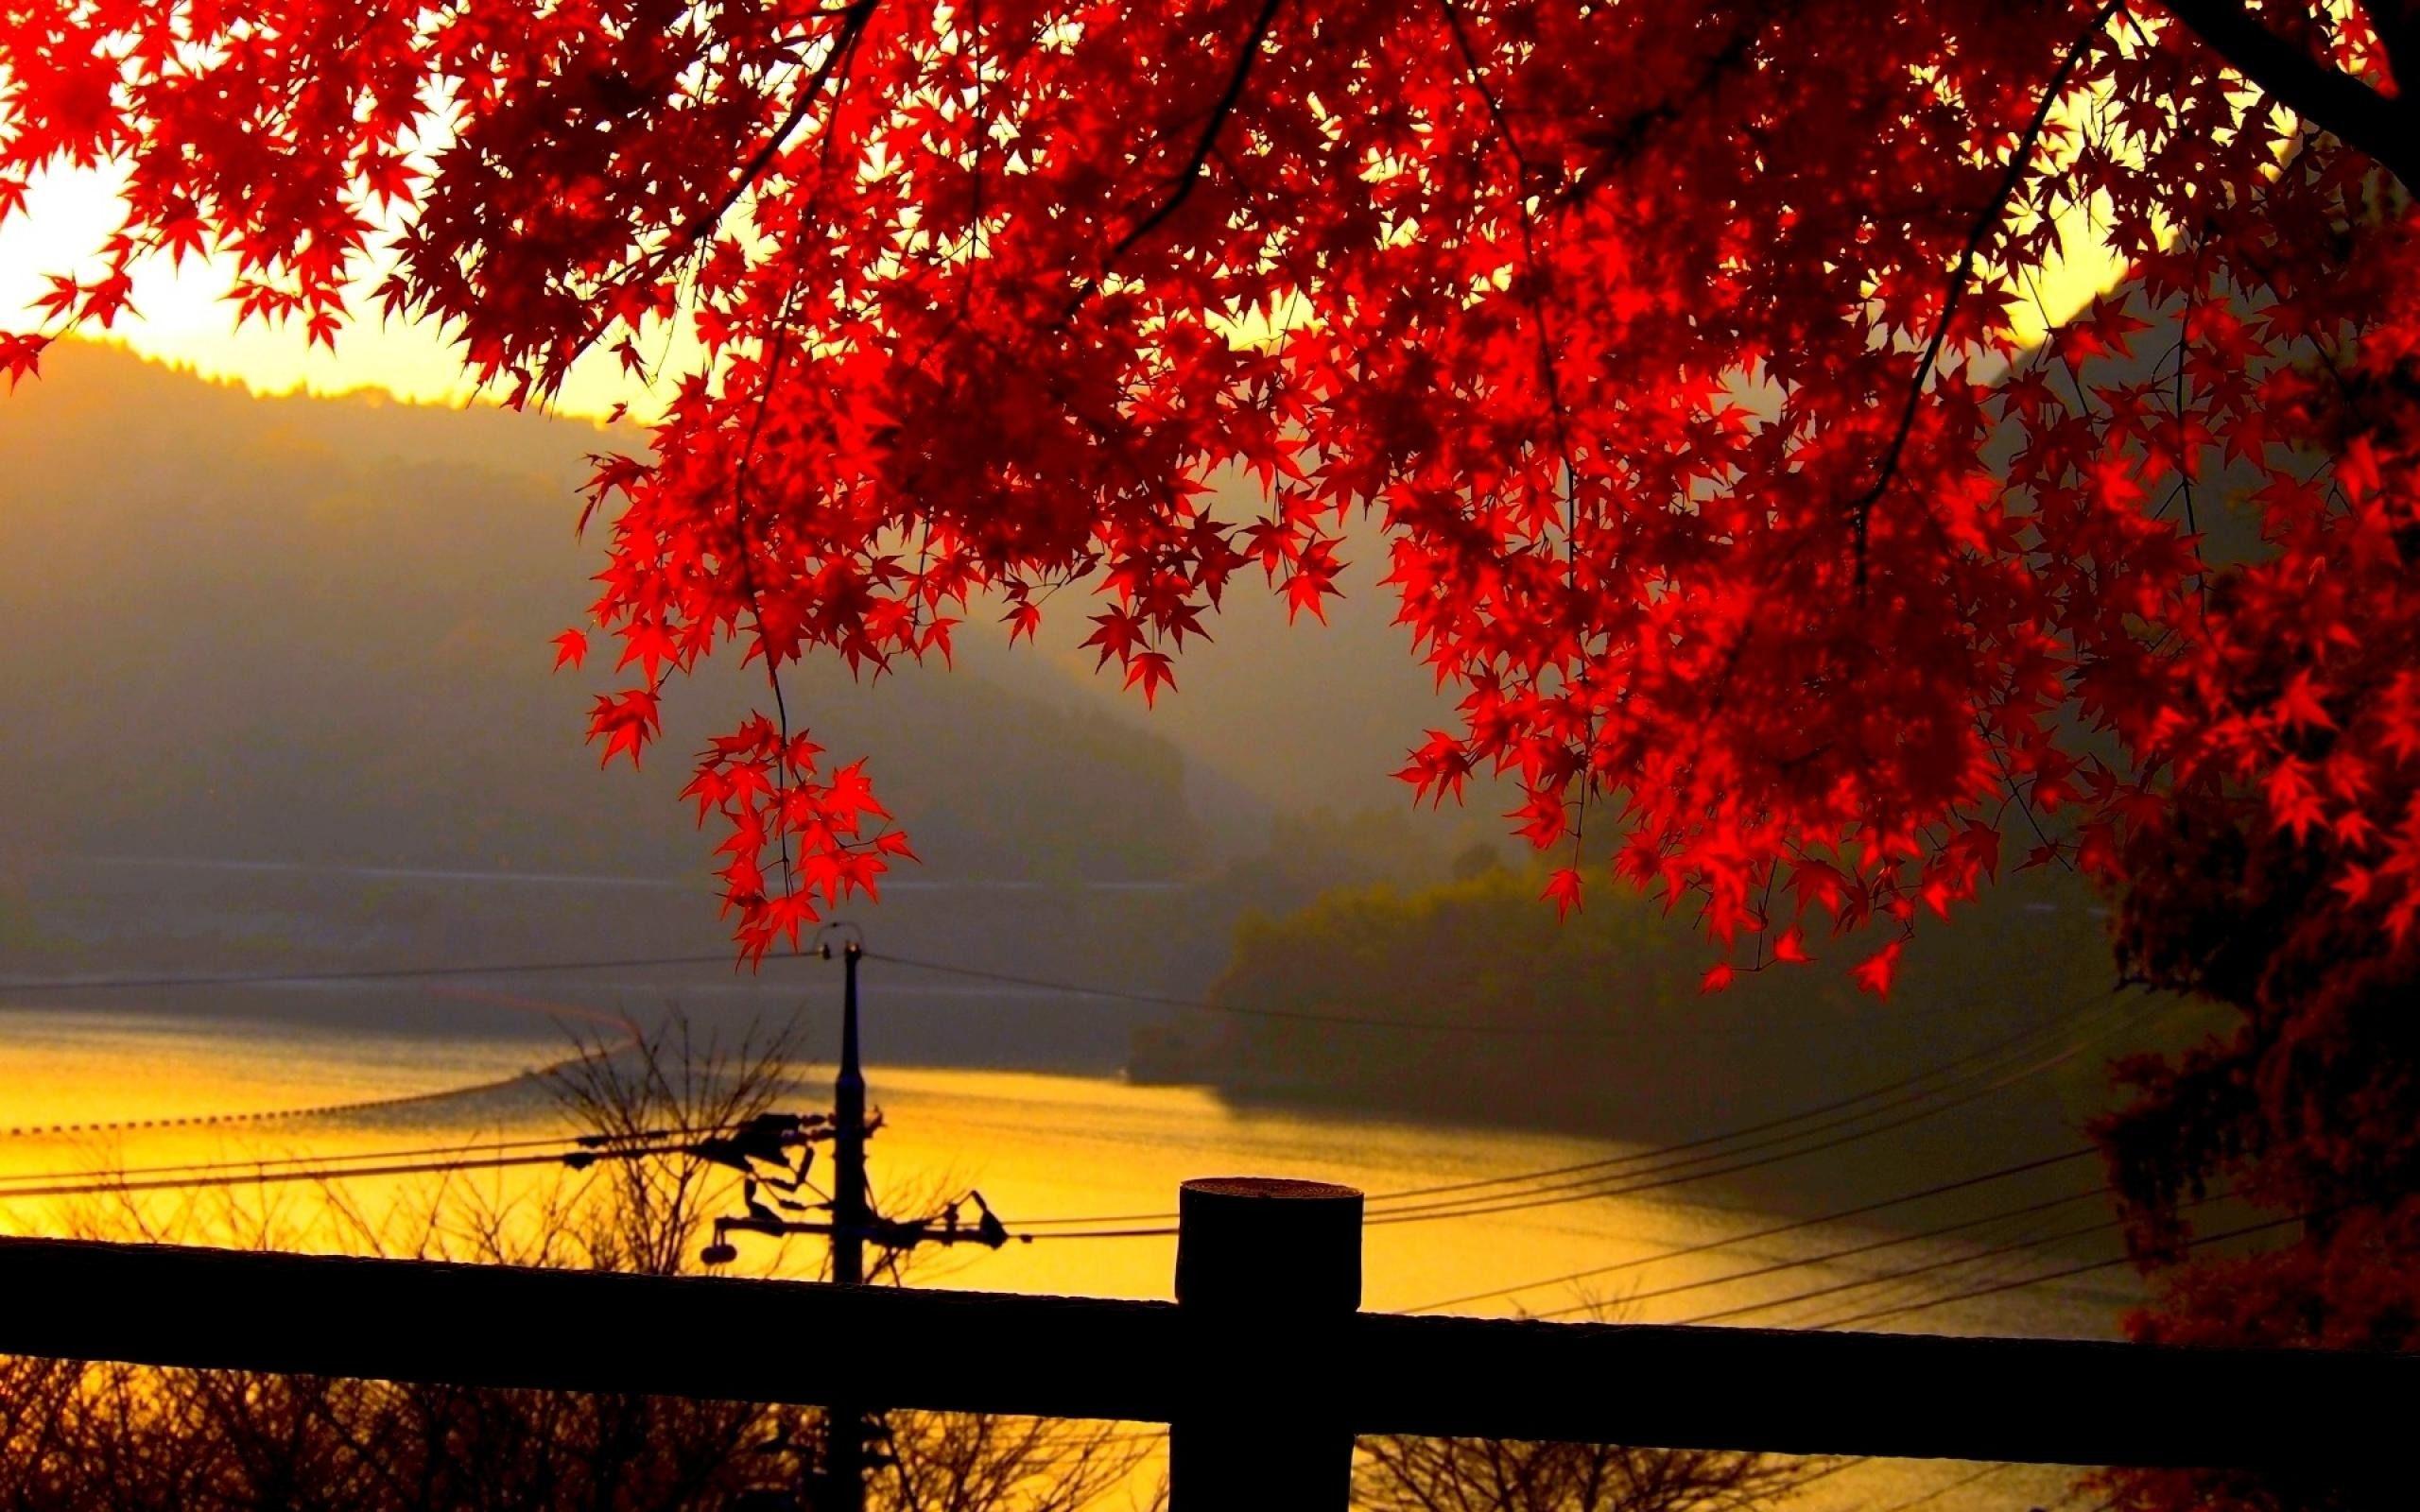 Autumn Landscape Wallpapers HD 27777 Wallpaper Download HD 2560x1600